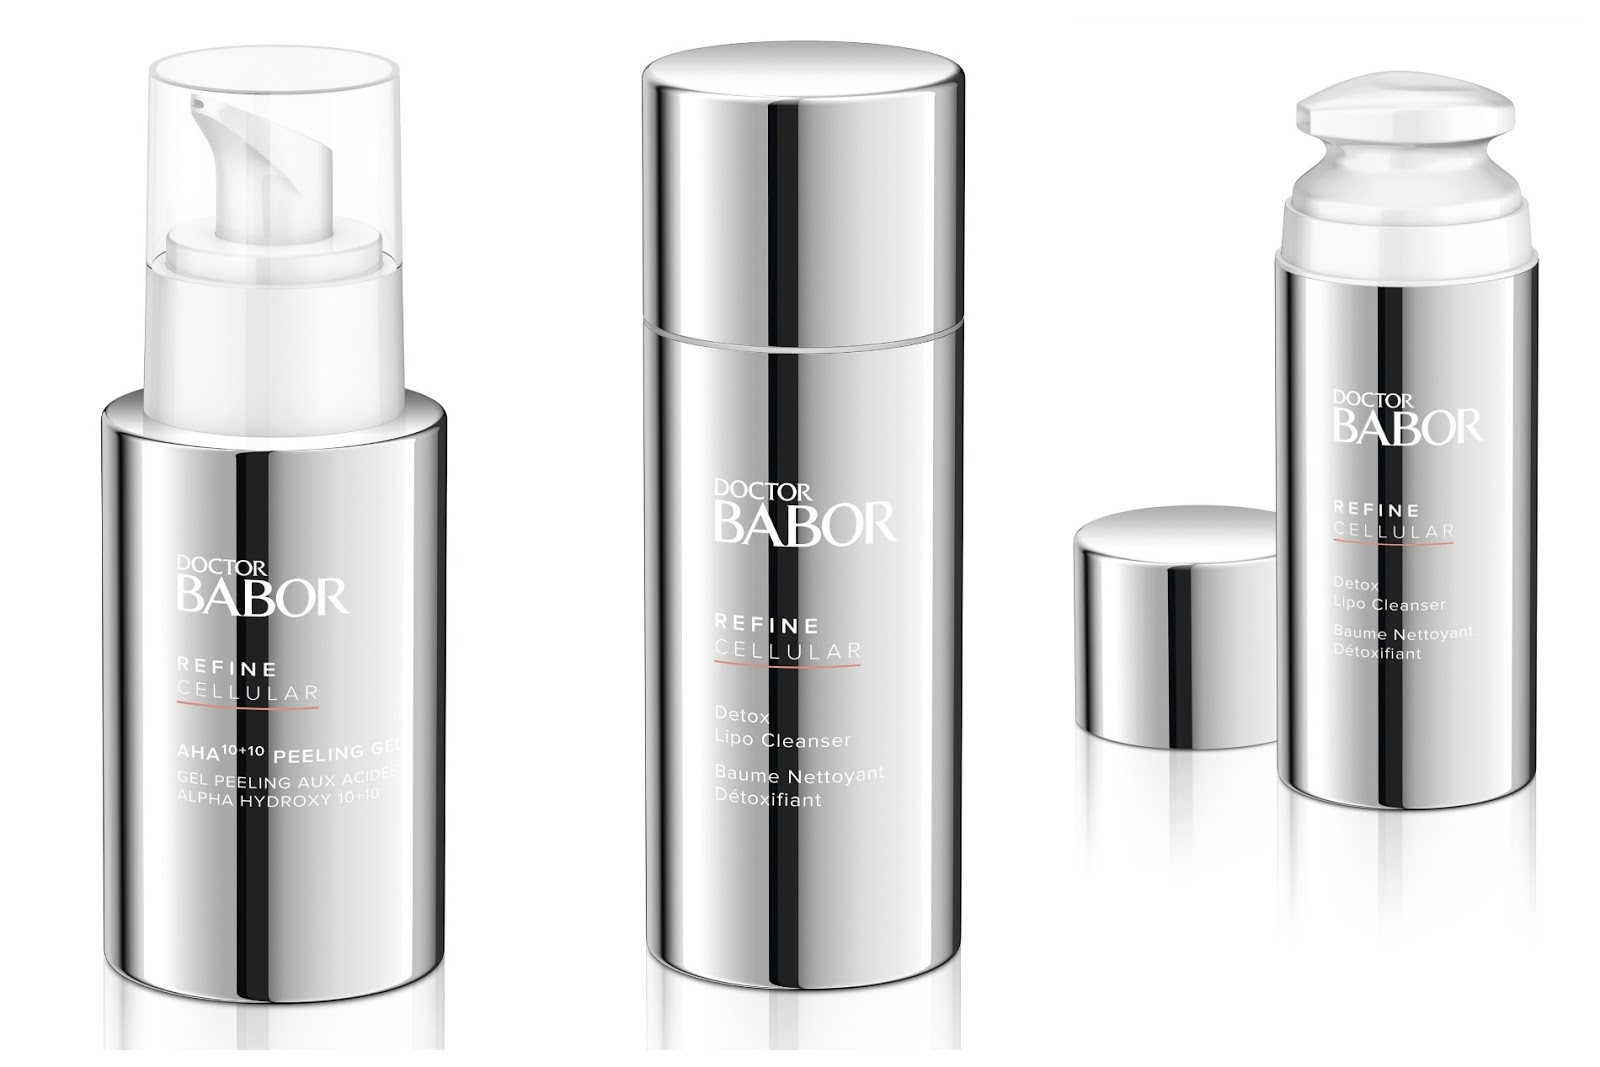 Babor Detox Lipo Cleanser en AHA 10+10 Peeling Gel